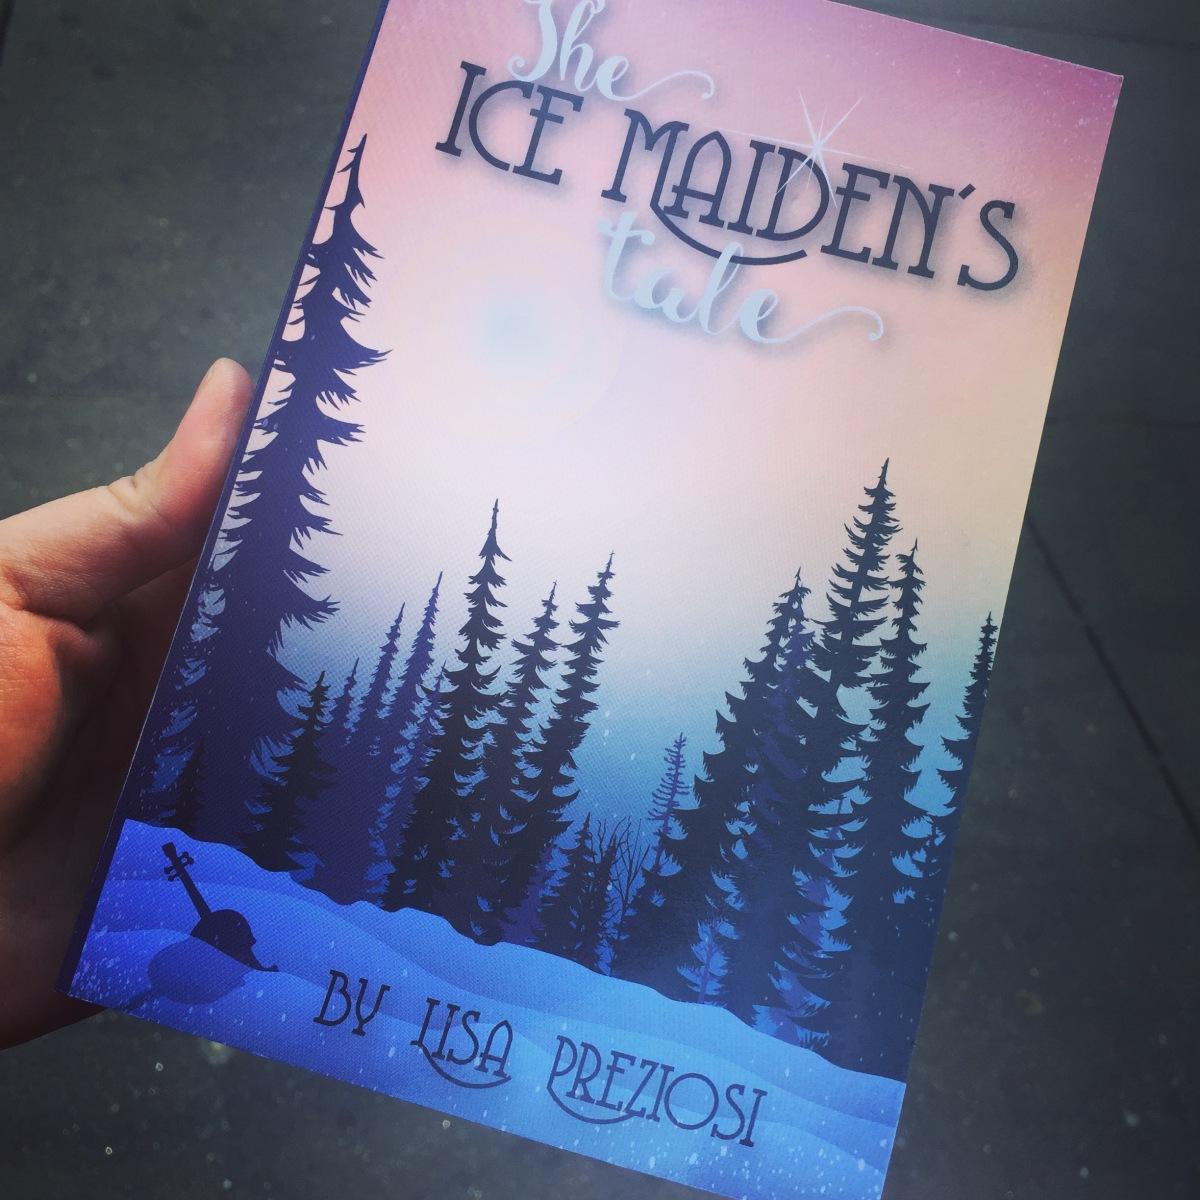 Writer's Shelf: The Ice Maiden's Tale – KindlePresale!